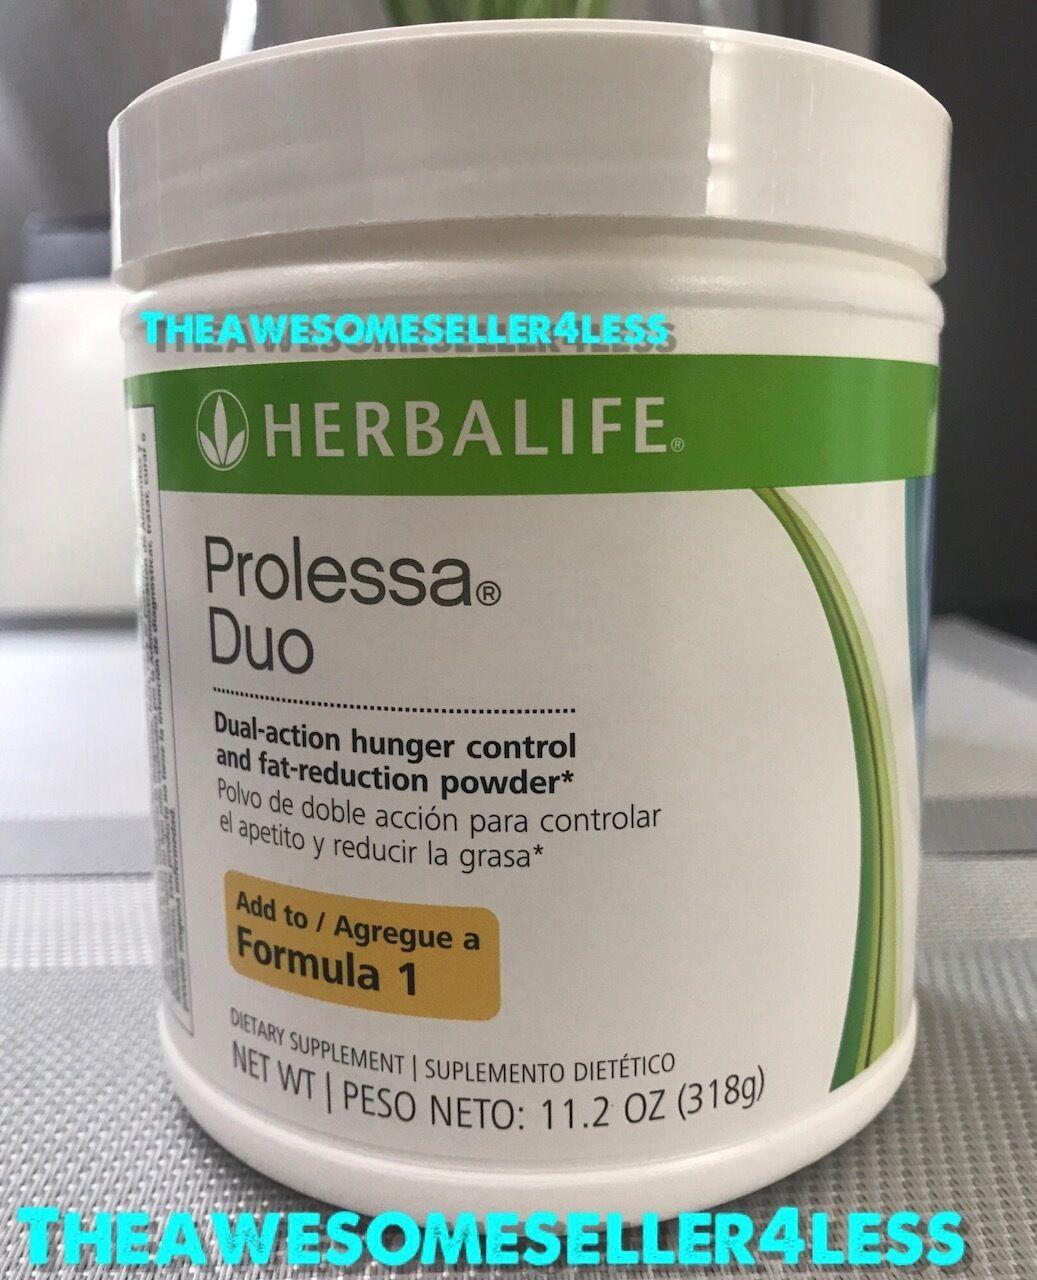 NEW Herbalife PROLESSA DUO 11.2 oz Weight Management Powder - 30 Day Supply